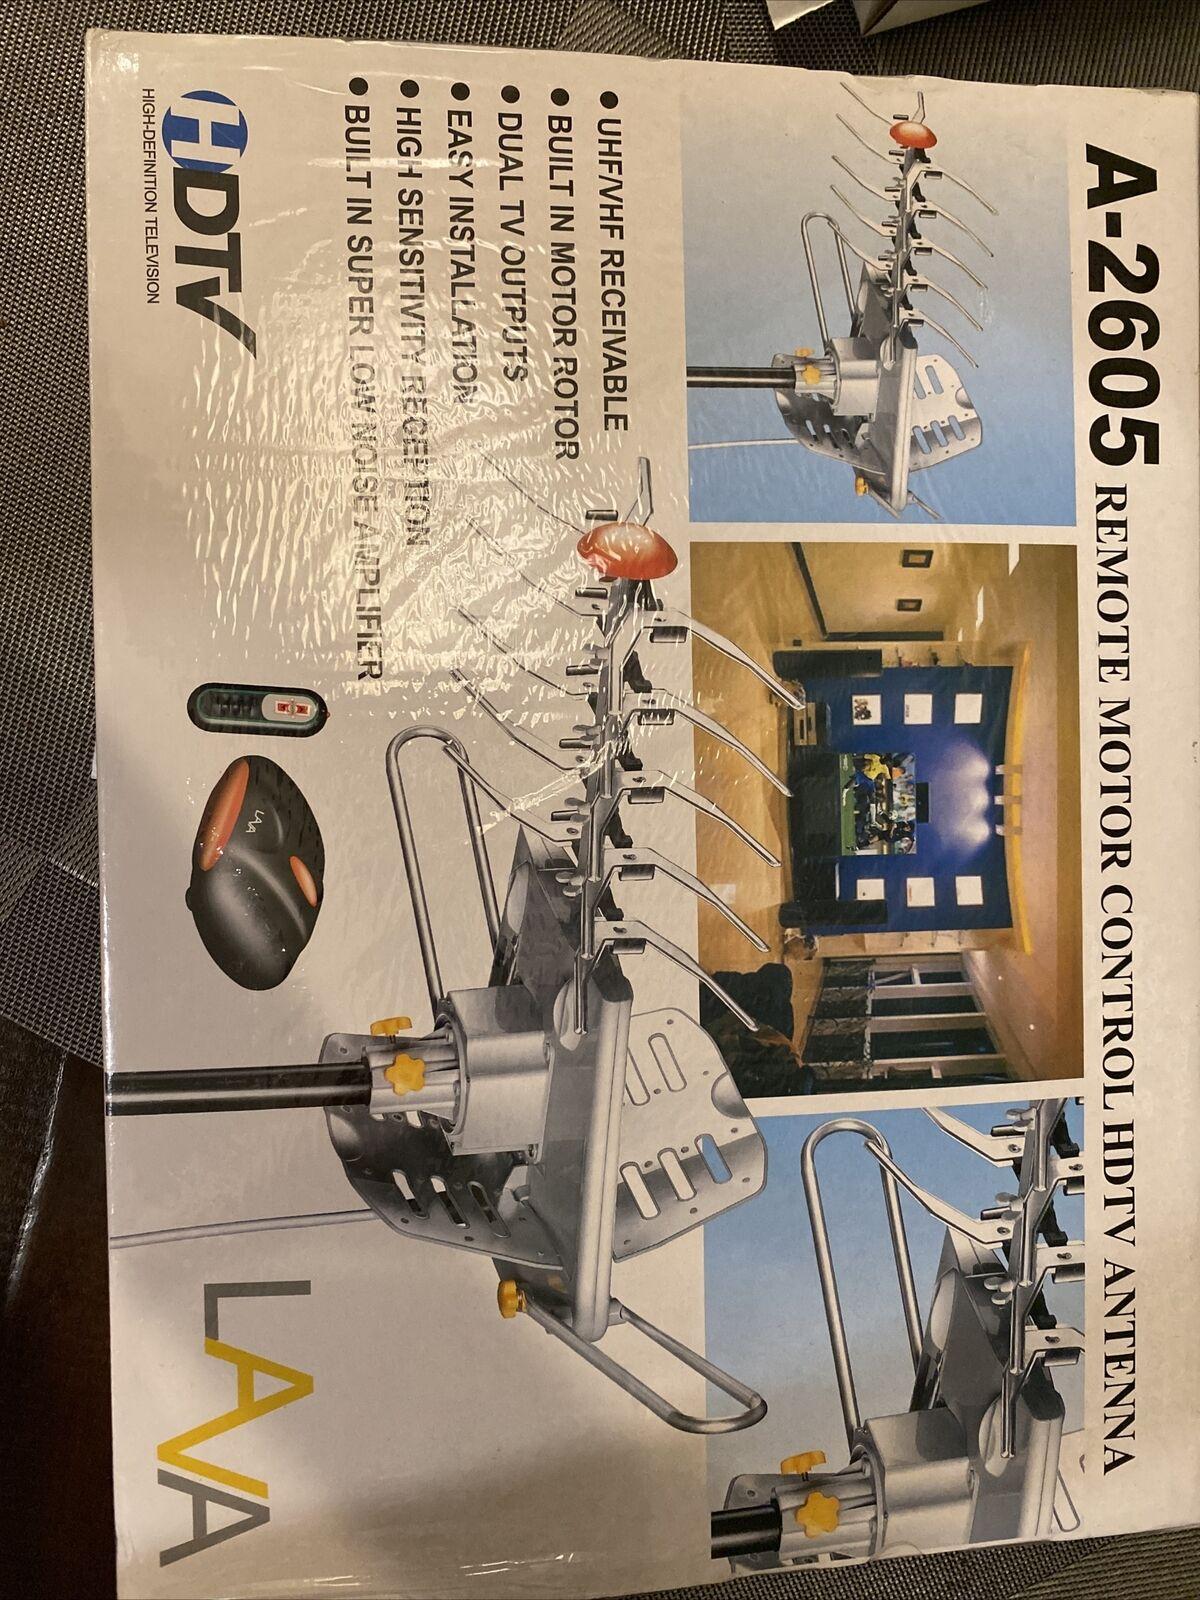 HD-2605 ghettogandhi1 LAVA HD2605 HDTV DIGITAL ROTOR AMPLIFIED OUTDOOR TV ANTENNA HD UHF VHF FM CABLE